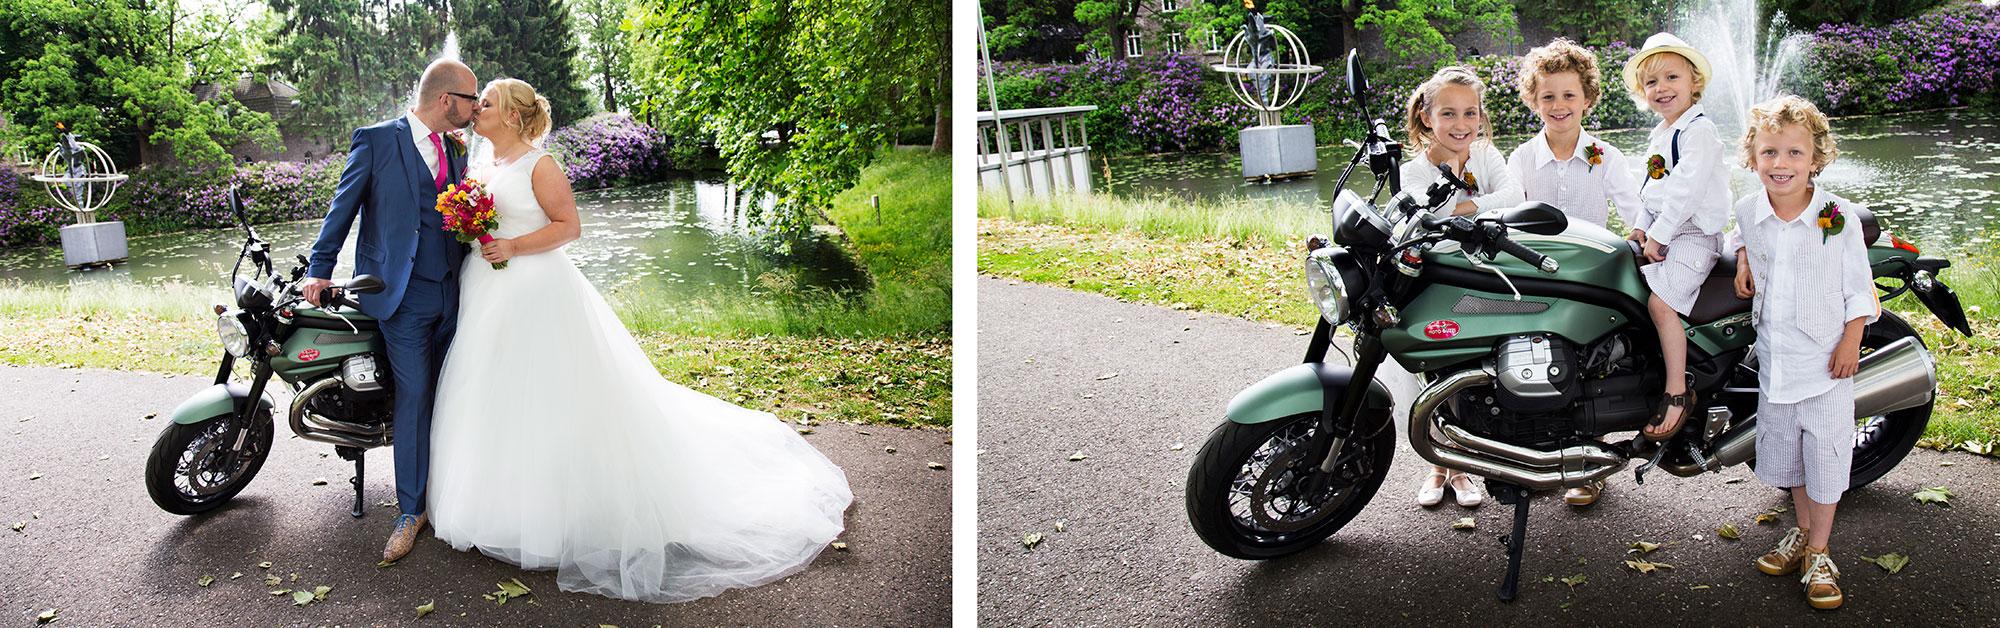 spontane trouwfotograaf stadspark